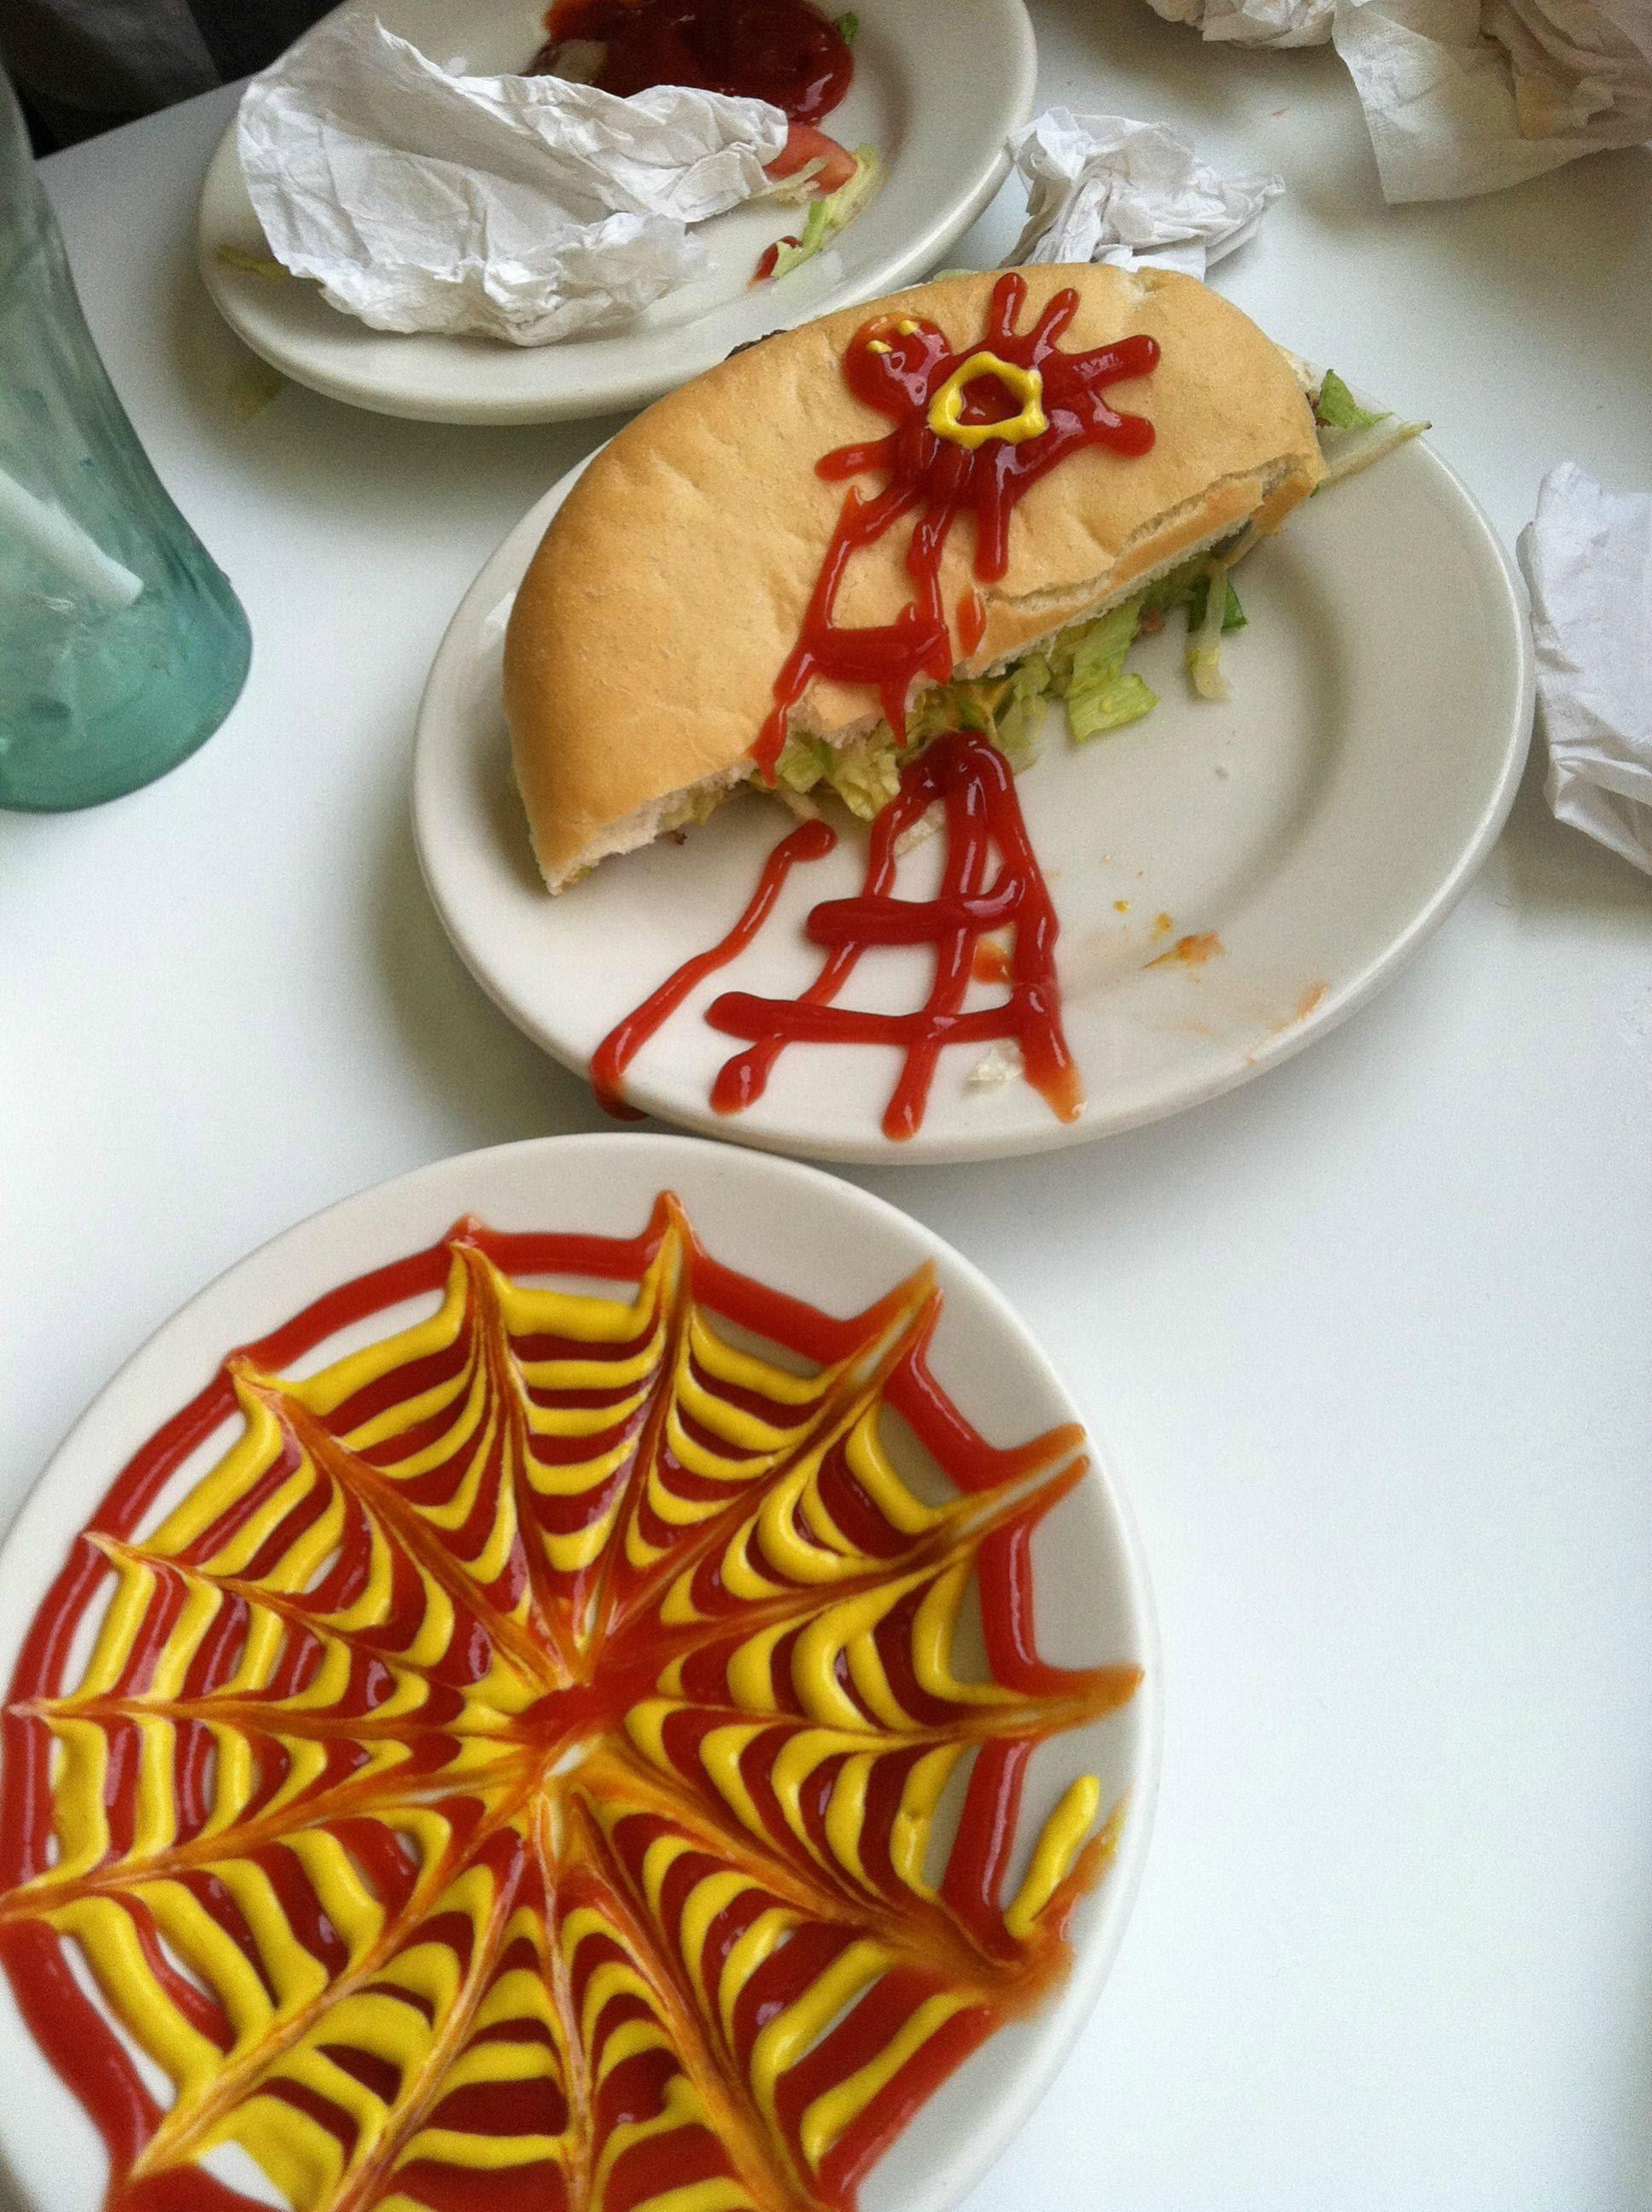 Playing with my food or art? ART - muwasalat.com